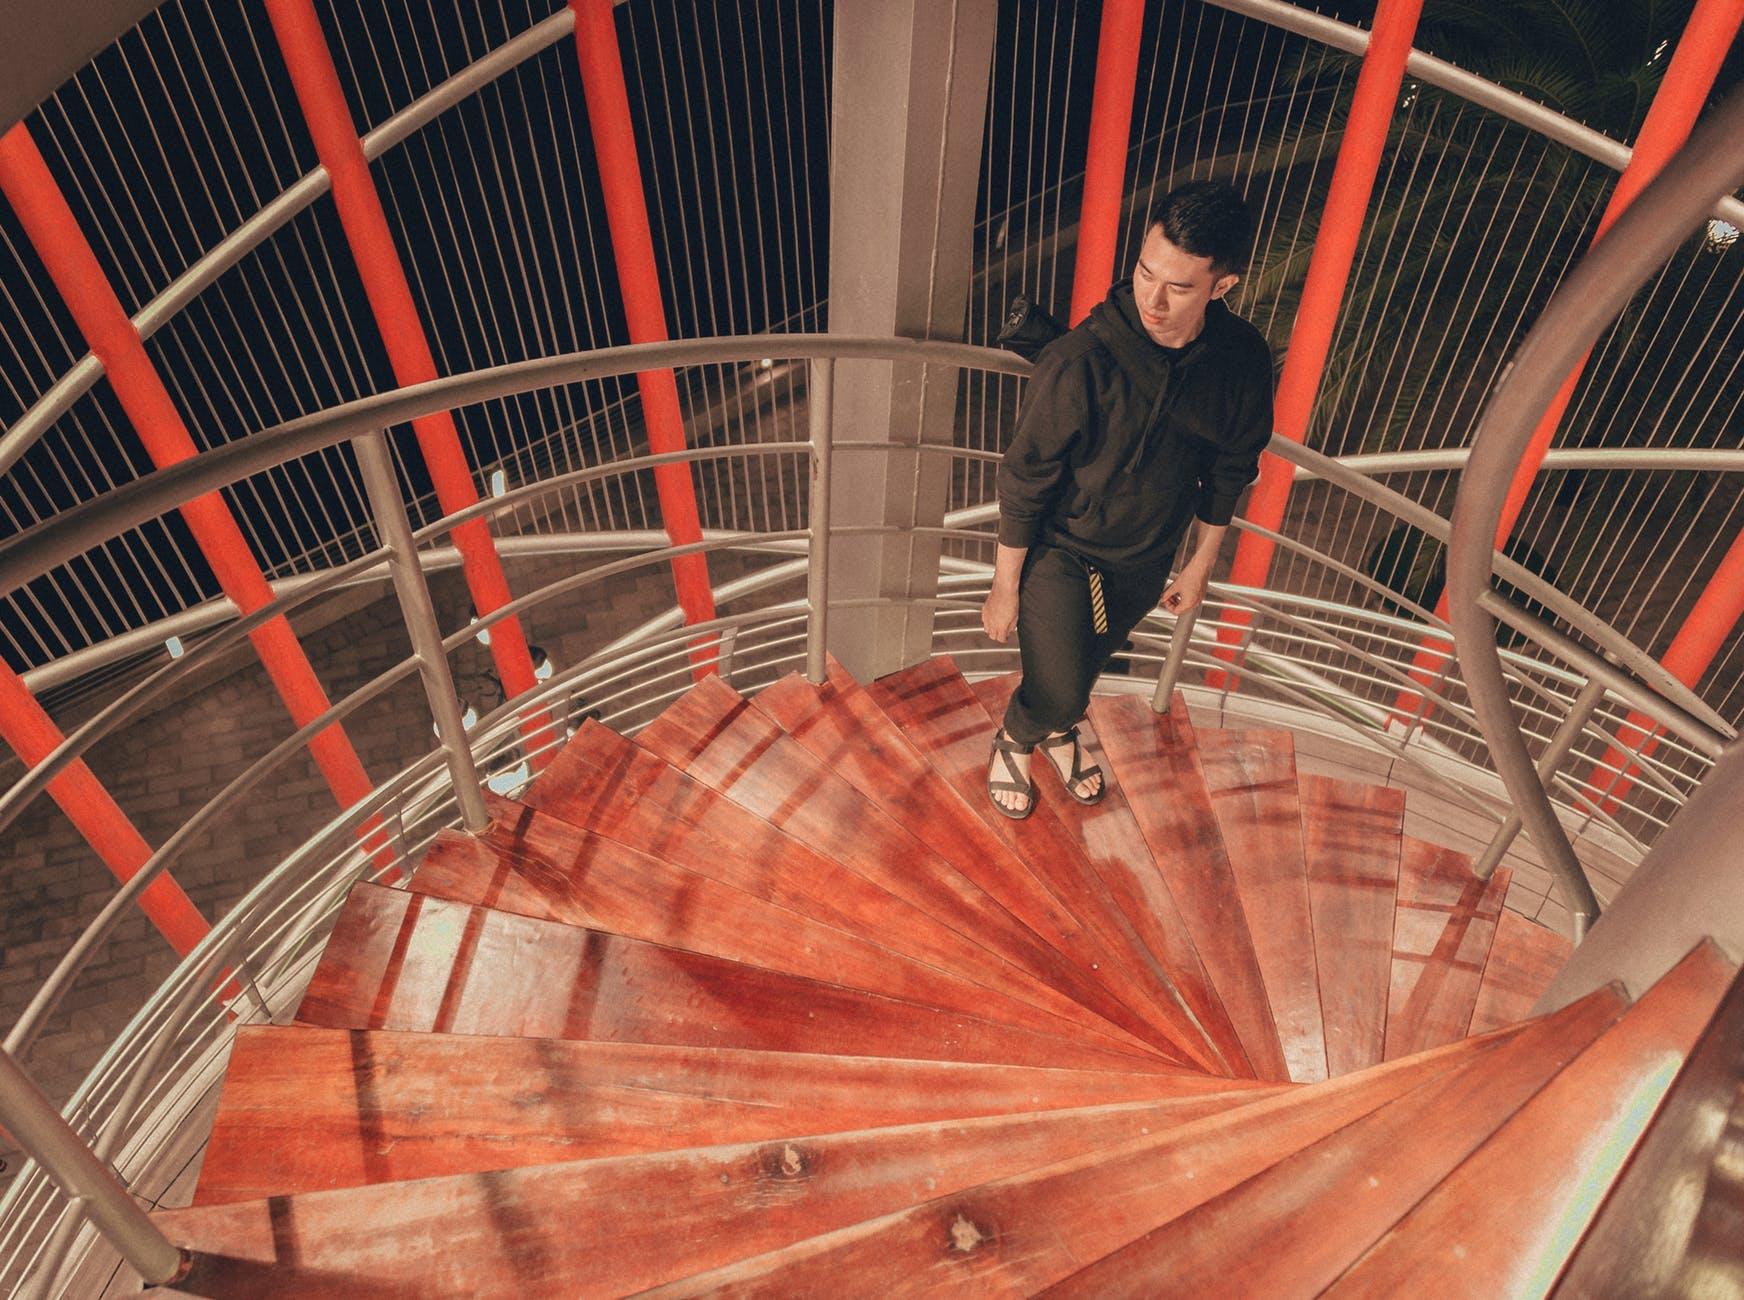 Man wearing black hoodie standing on staircase photo